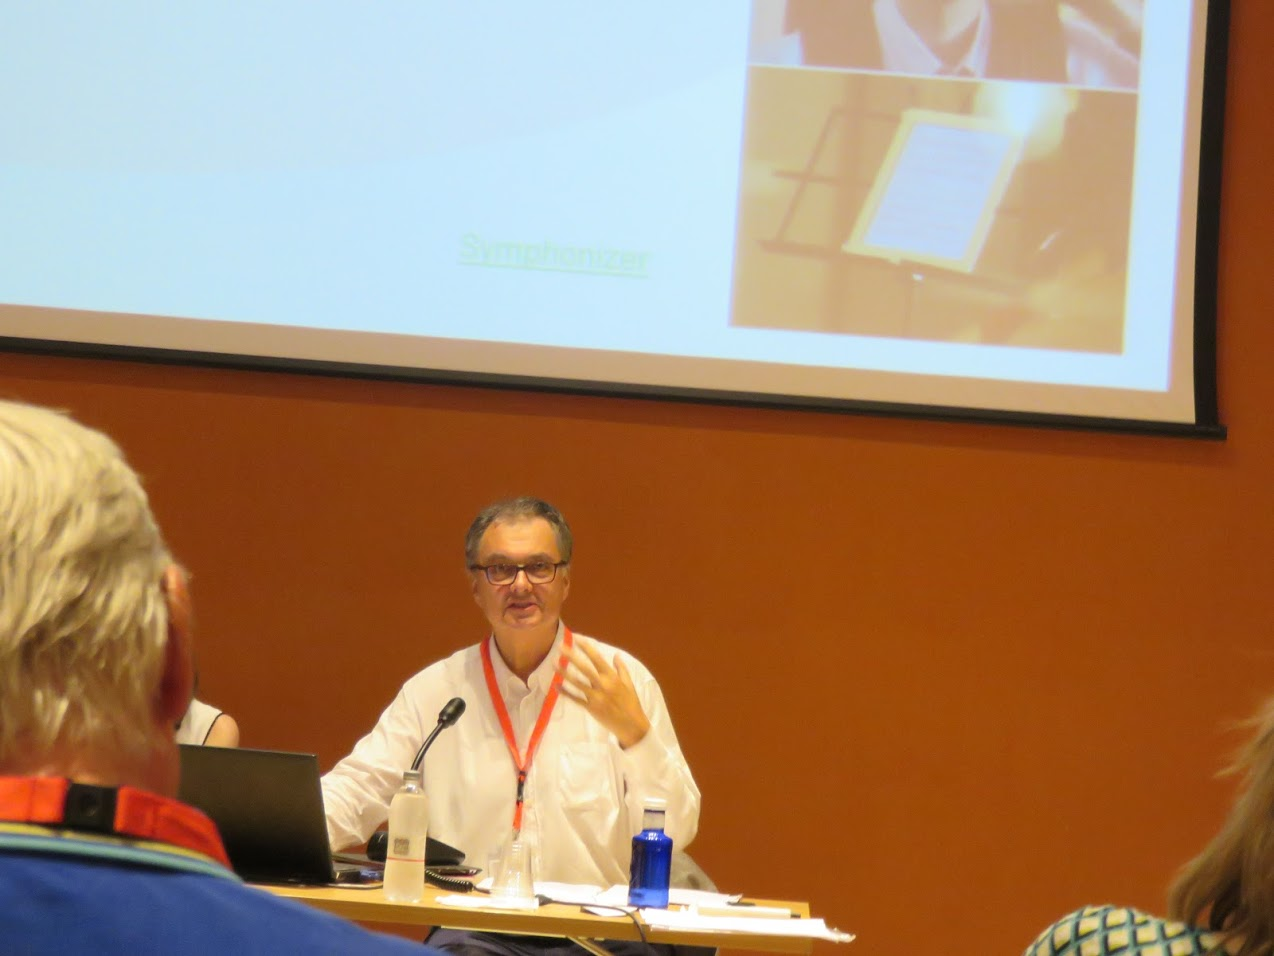 John Valk presentation, photo by Marianna Zsoldos